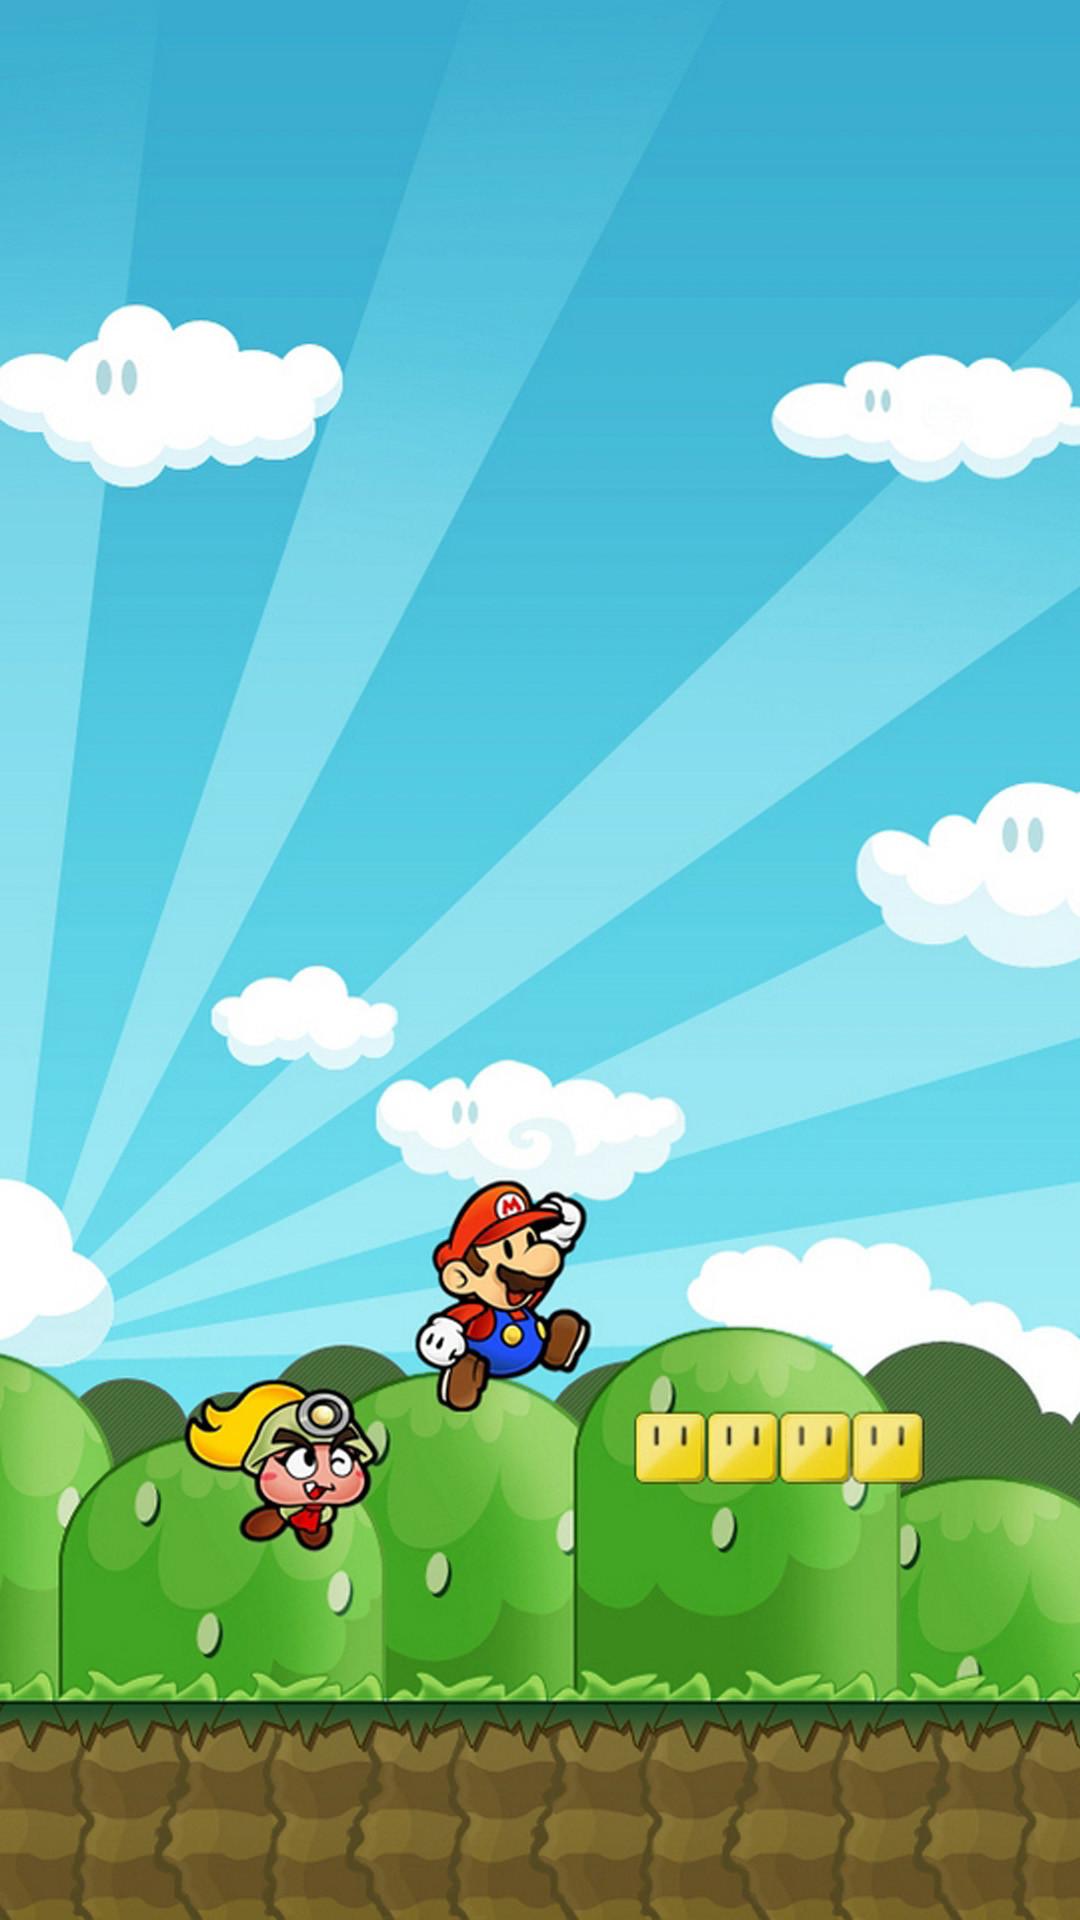 Mario Wallpaper for iphone 5